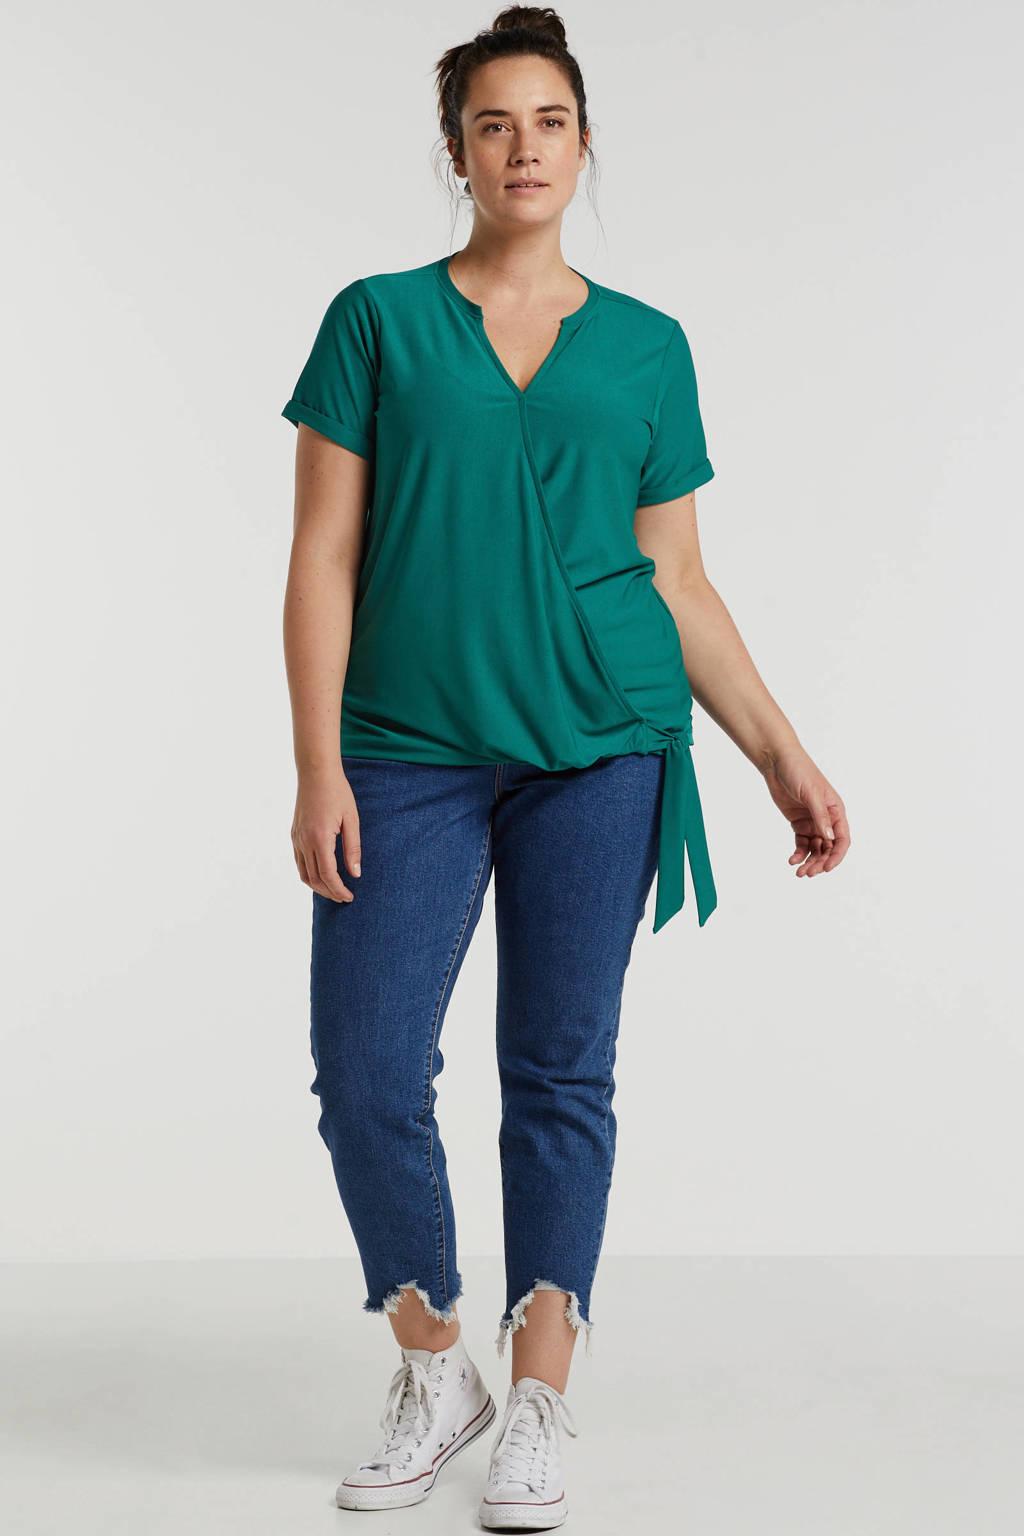 anytime overslag top Plus size groen, Groen